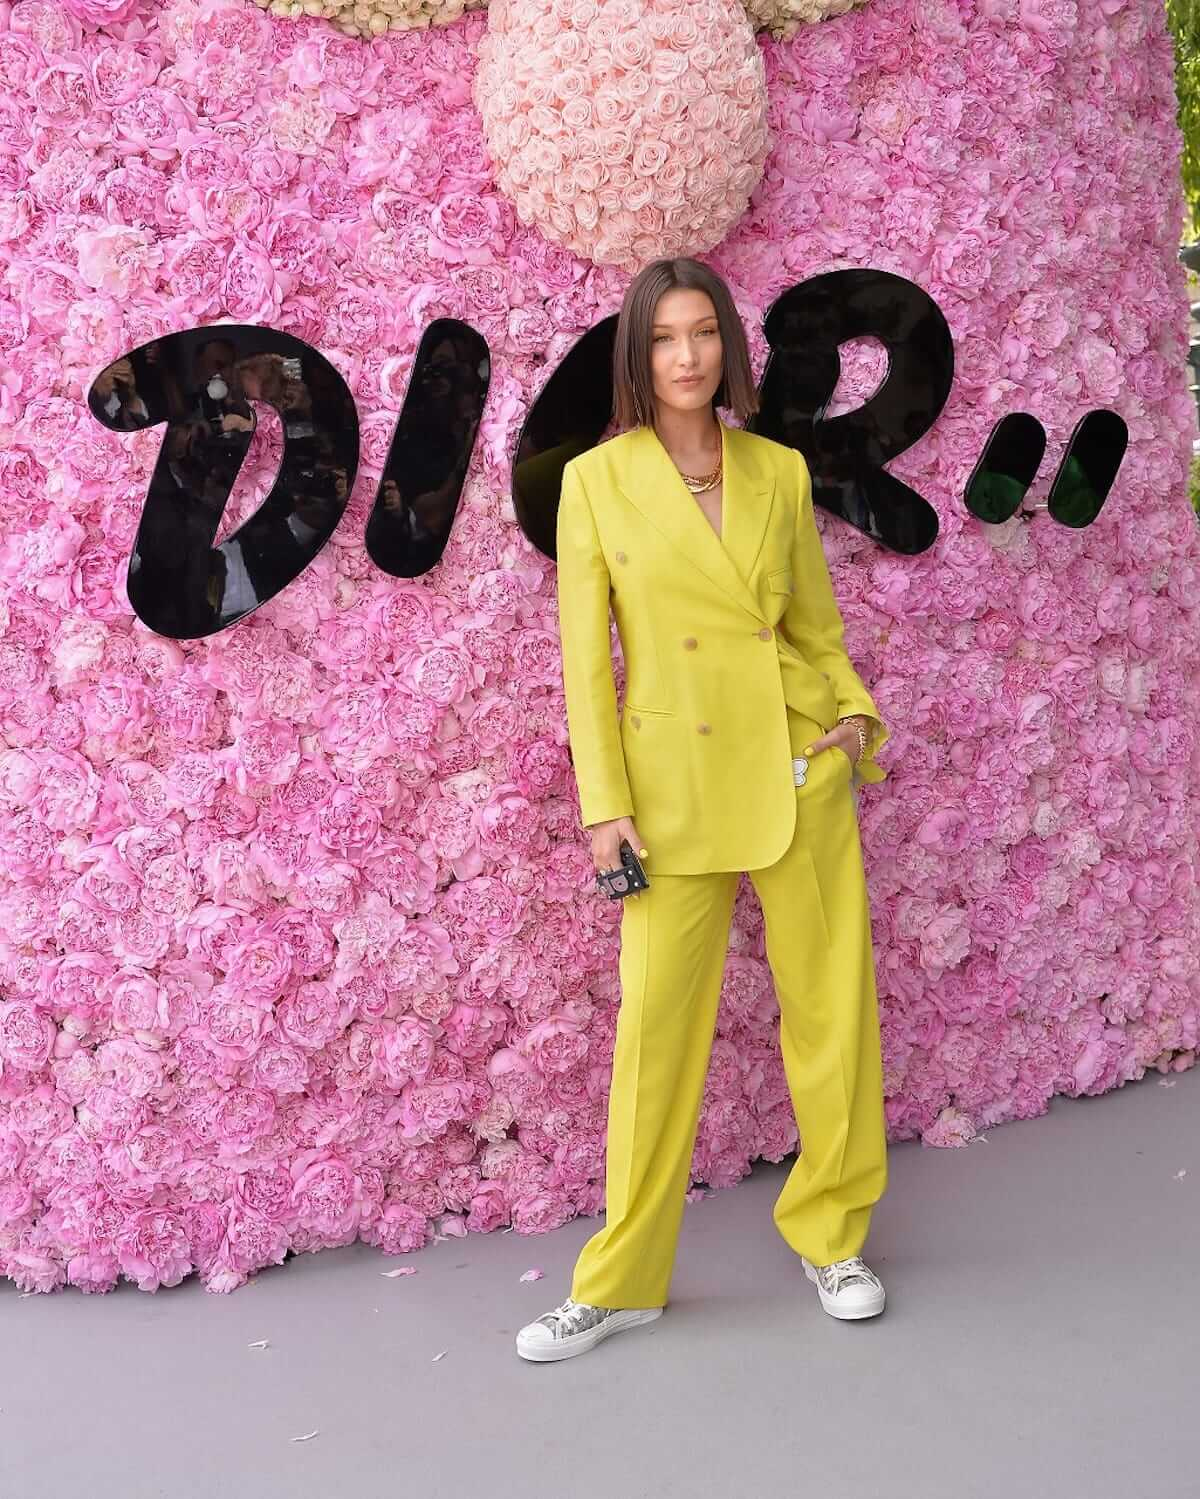 Dior Homme、キム・ジョーンズ就任後初コレクション。ベッカム親子、ケイト・モス、エイサップ・ロッキーら来場! fashion180626_dior_3-1200x1499